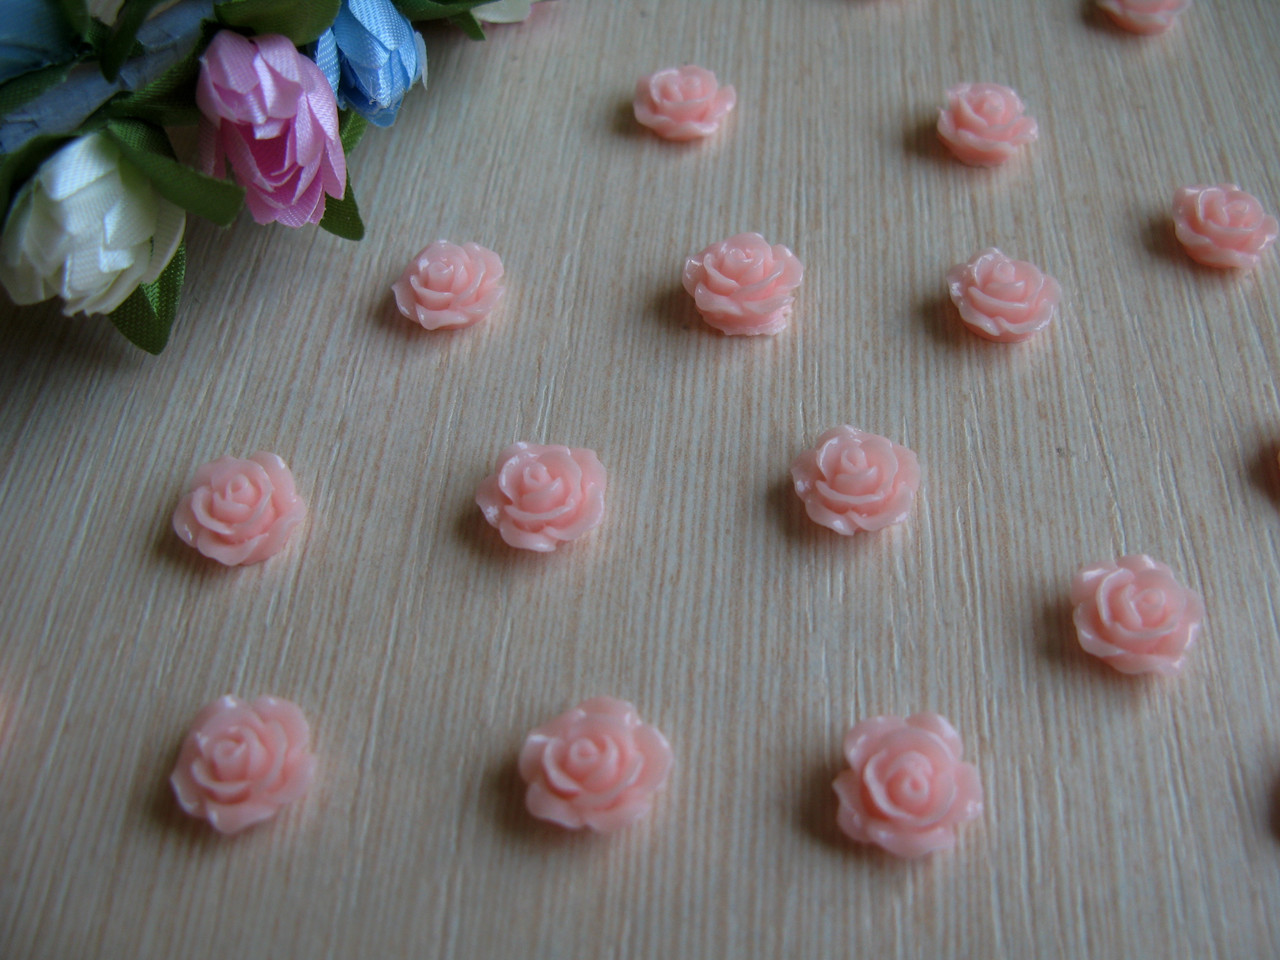 Серединка акриловая - Роза розово - персиковая малышка р-р - 9 мм цена 7.5 грн - 10 шт